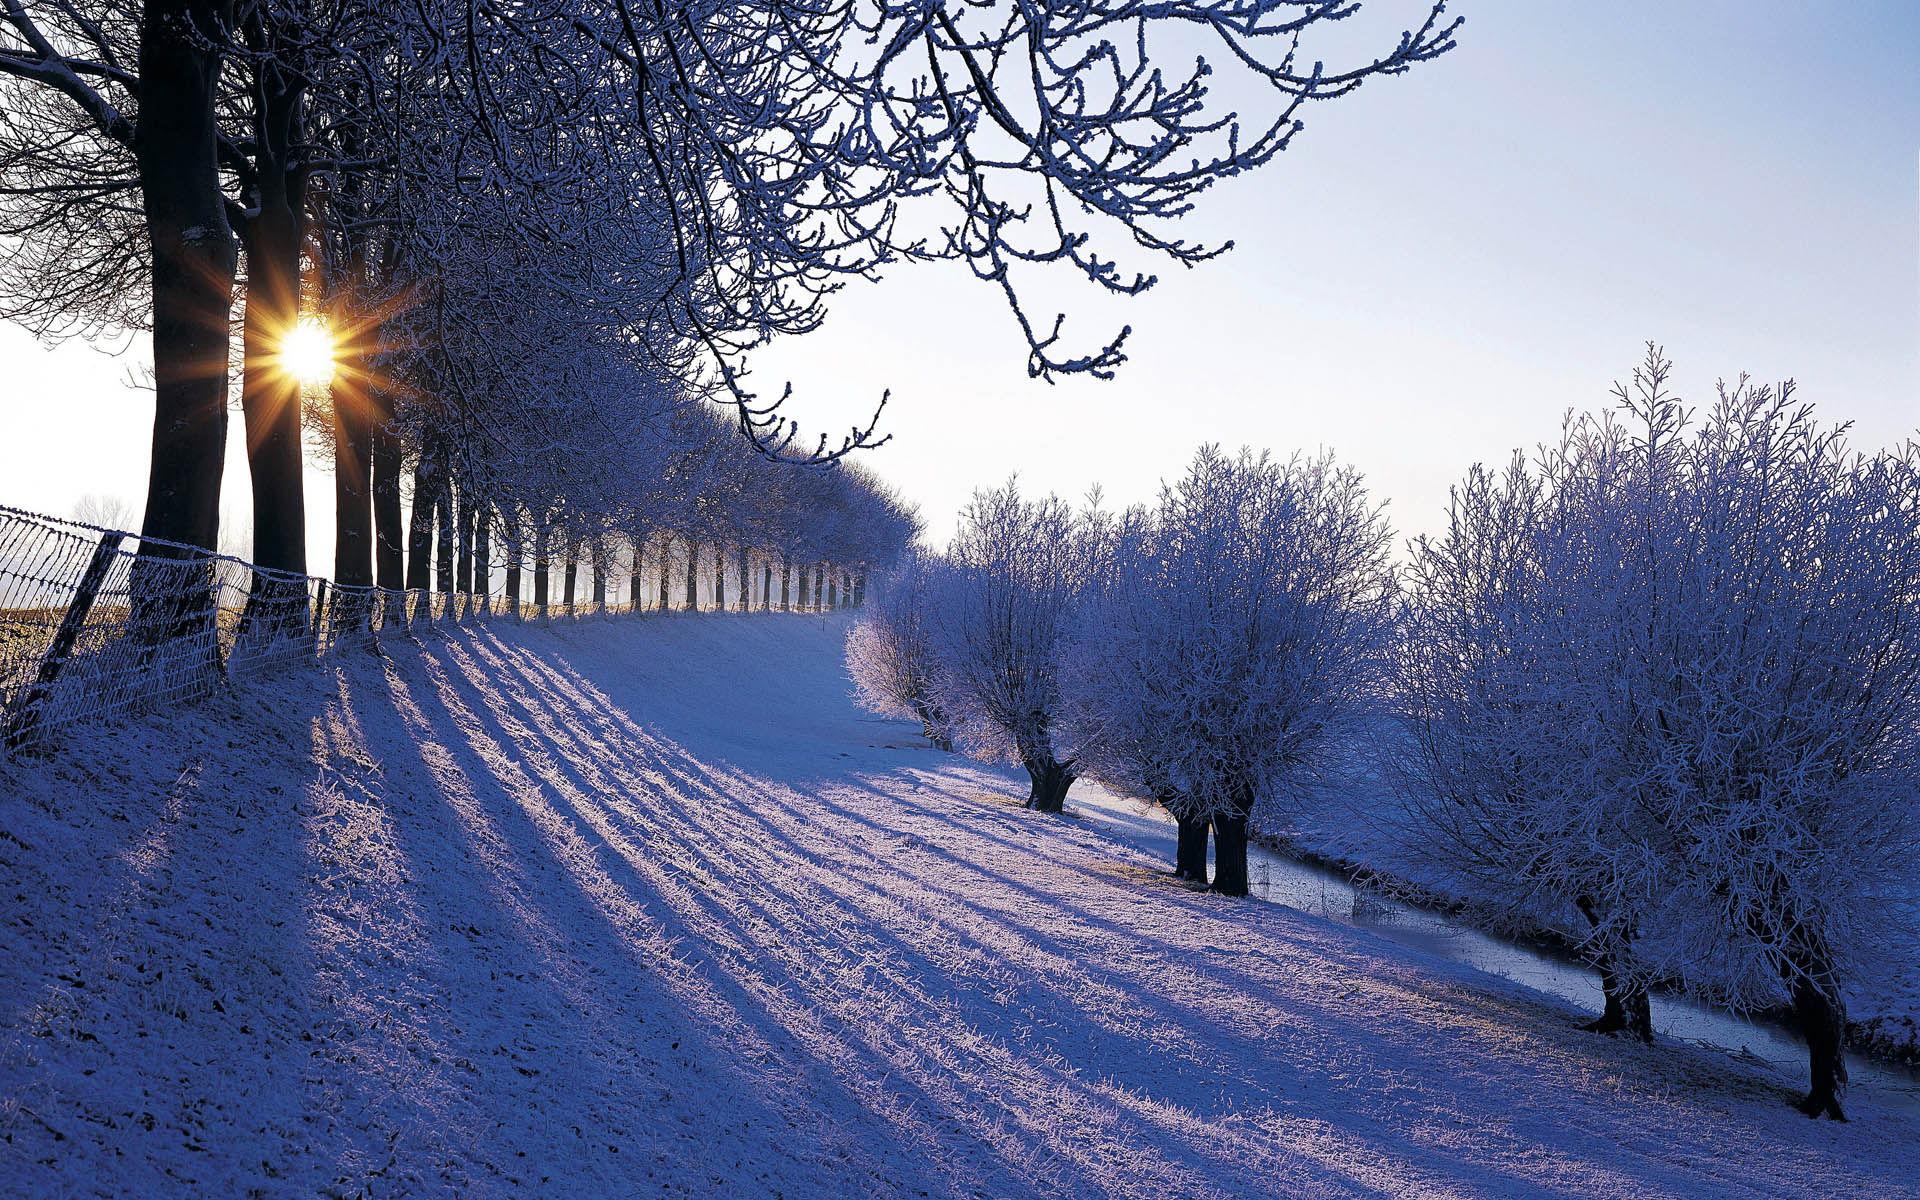 Night Sky Snow Hd Desktop Wallpaper High Definition